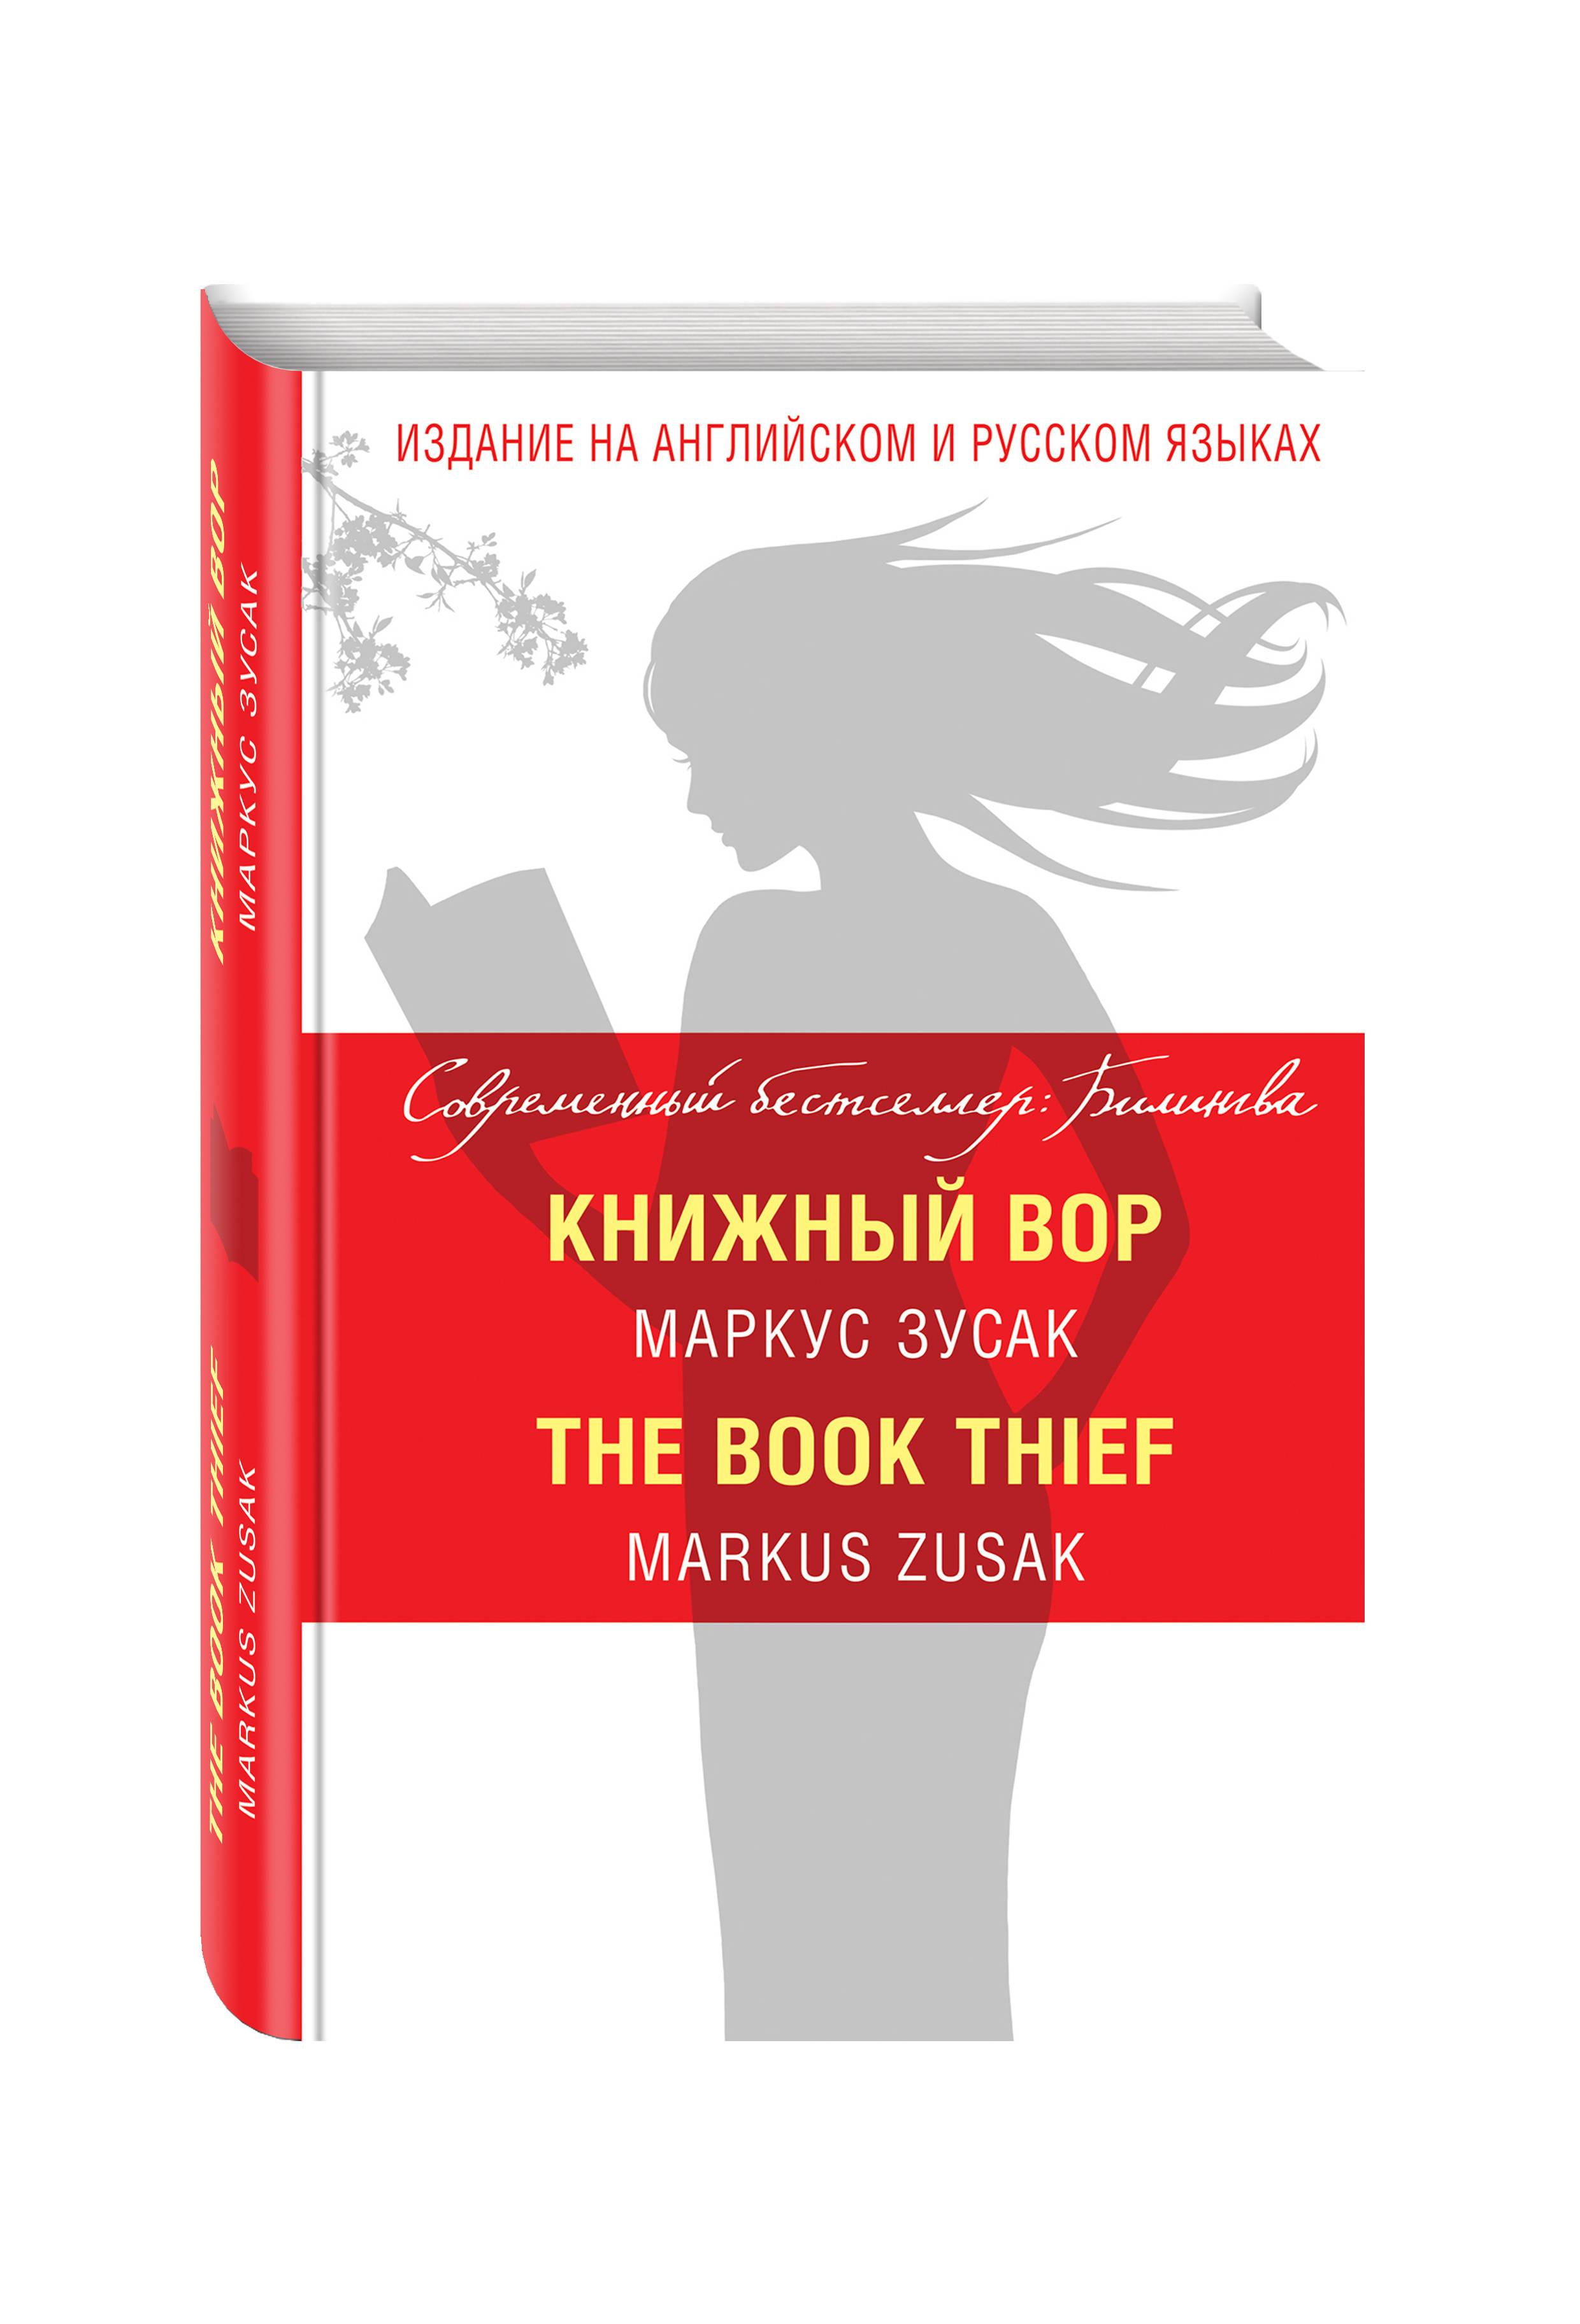 Зусак М. Книжный вор = The Book Thief